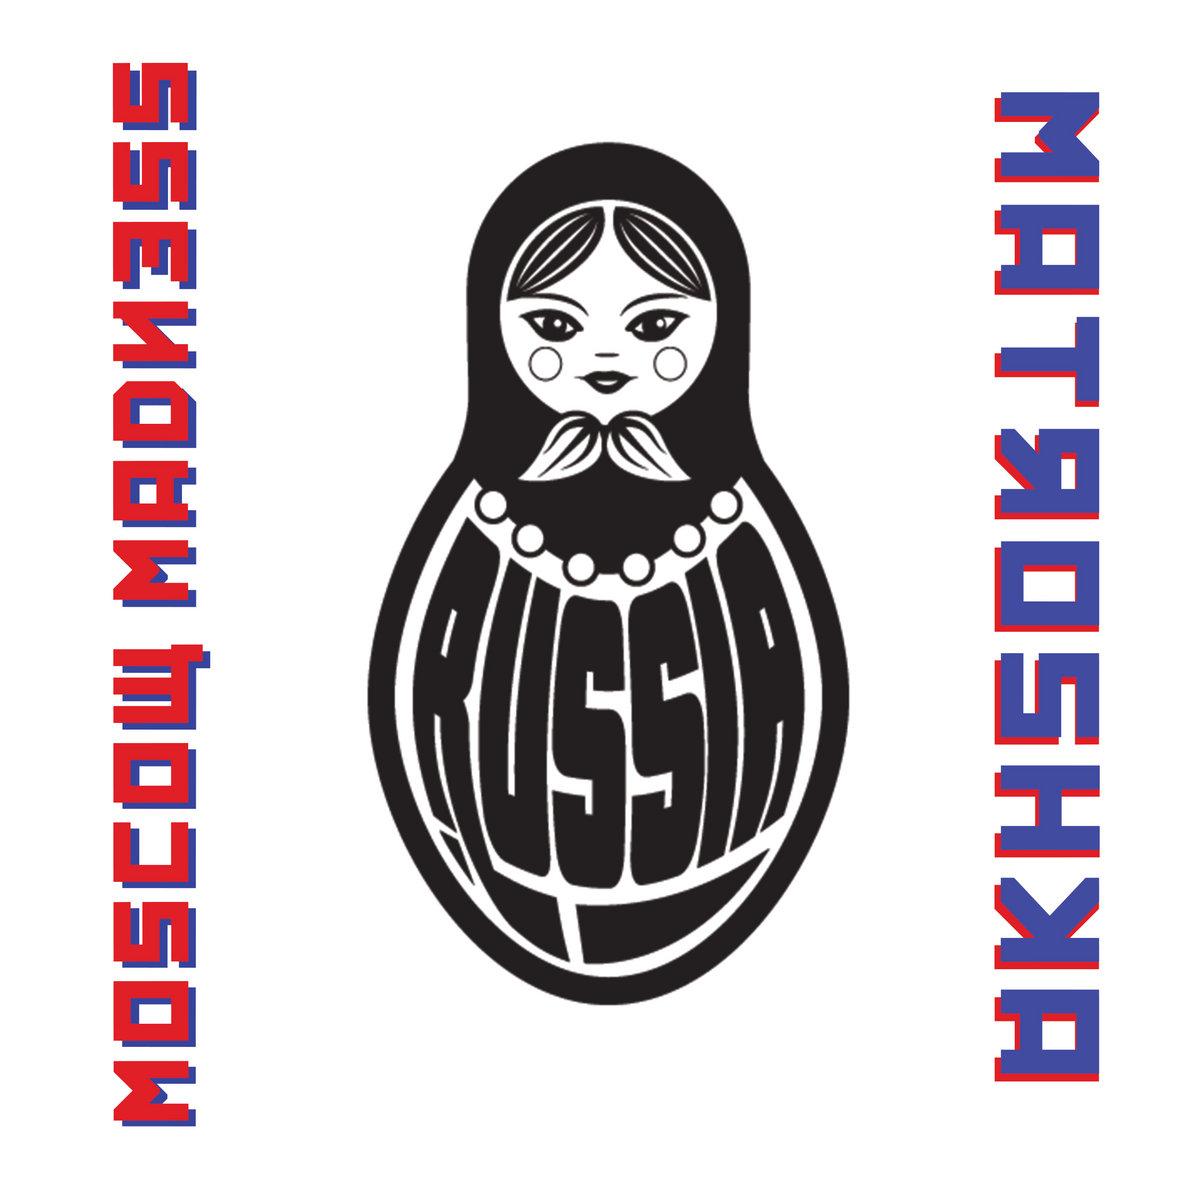 Matroshka